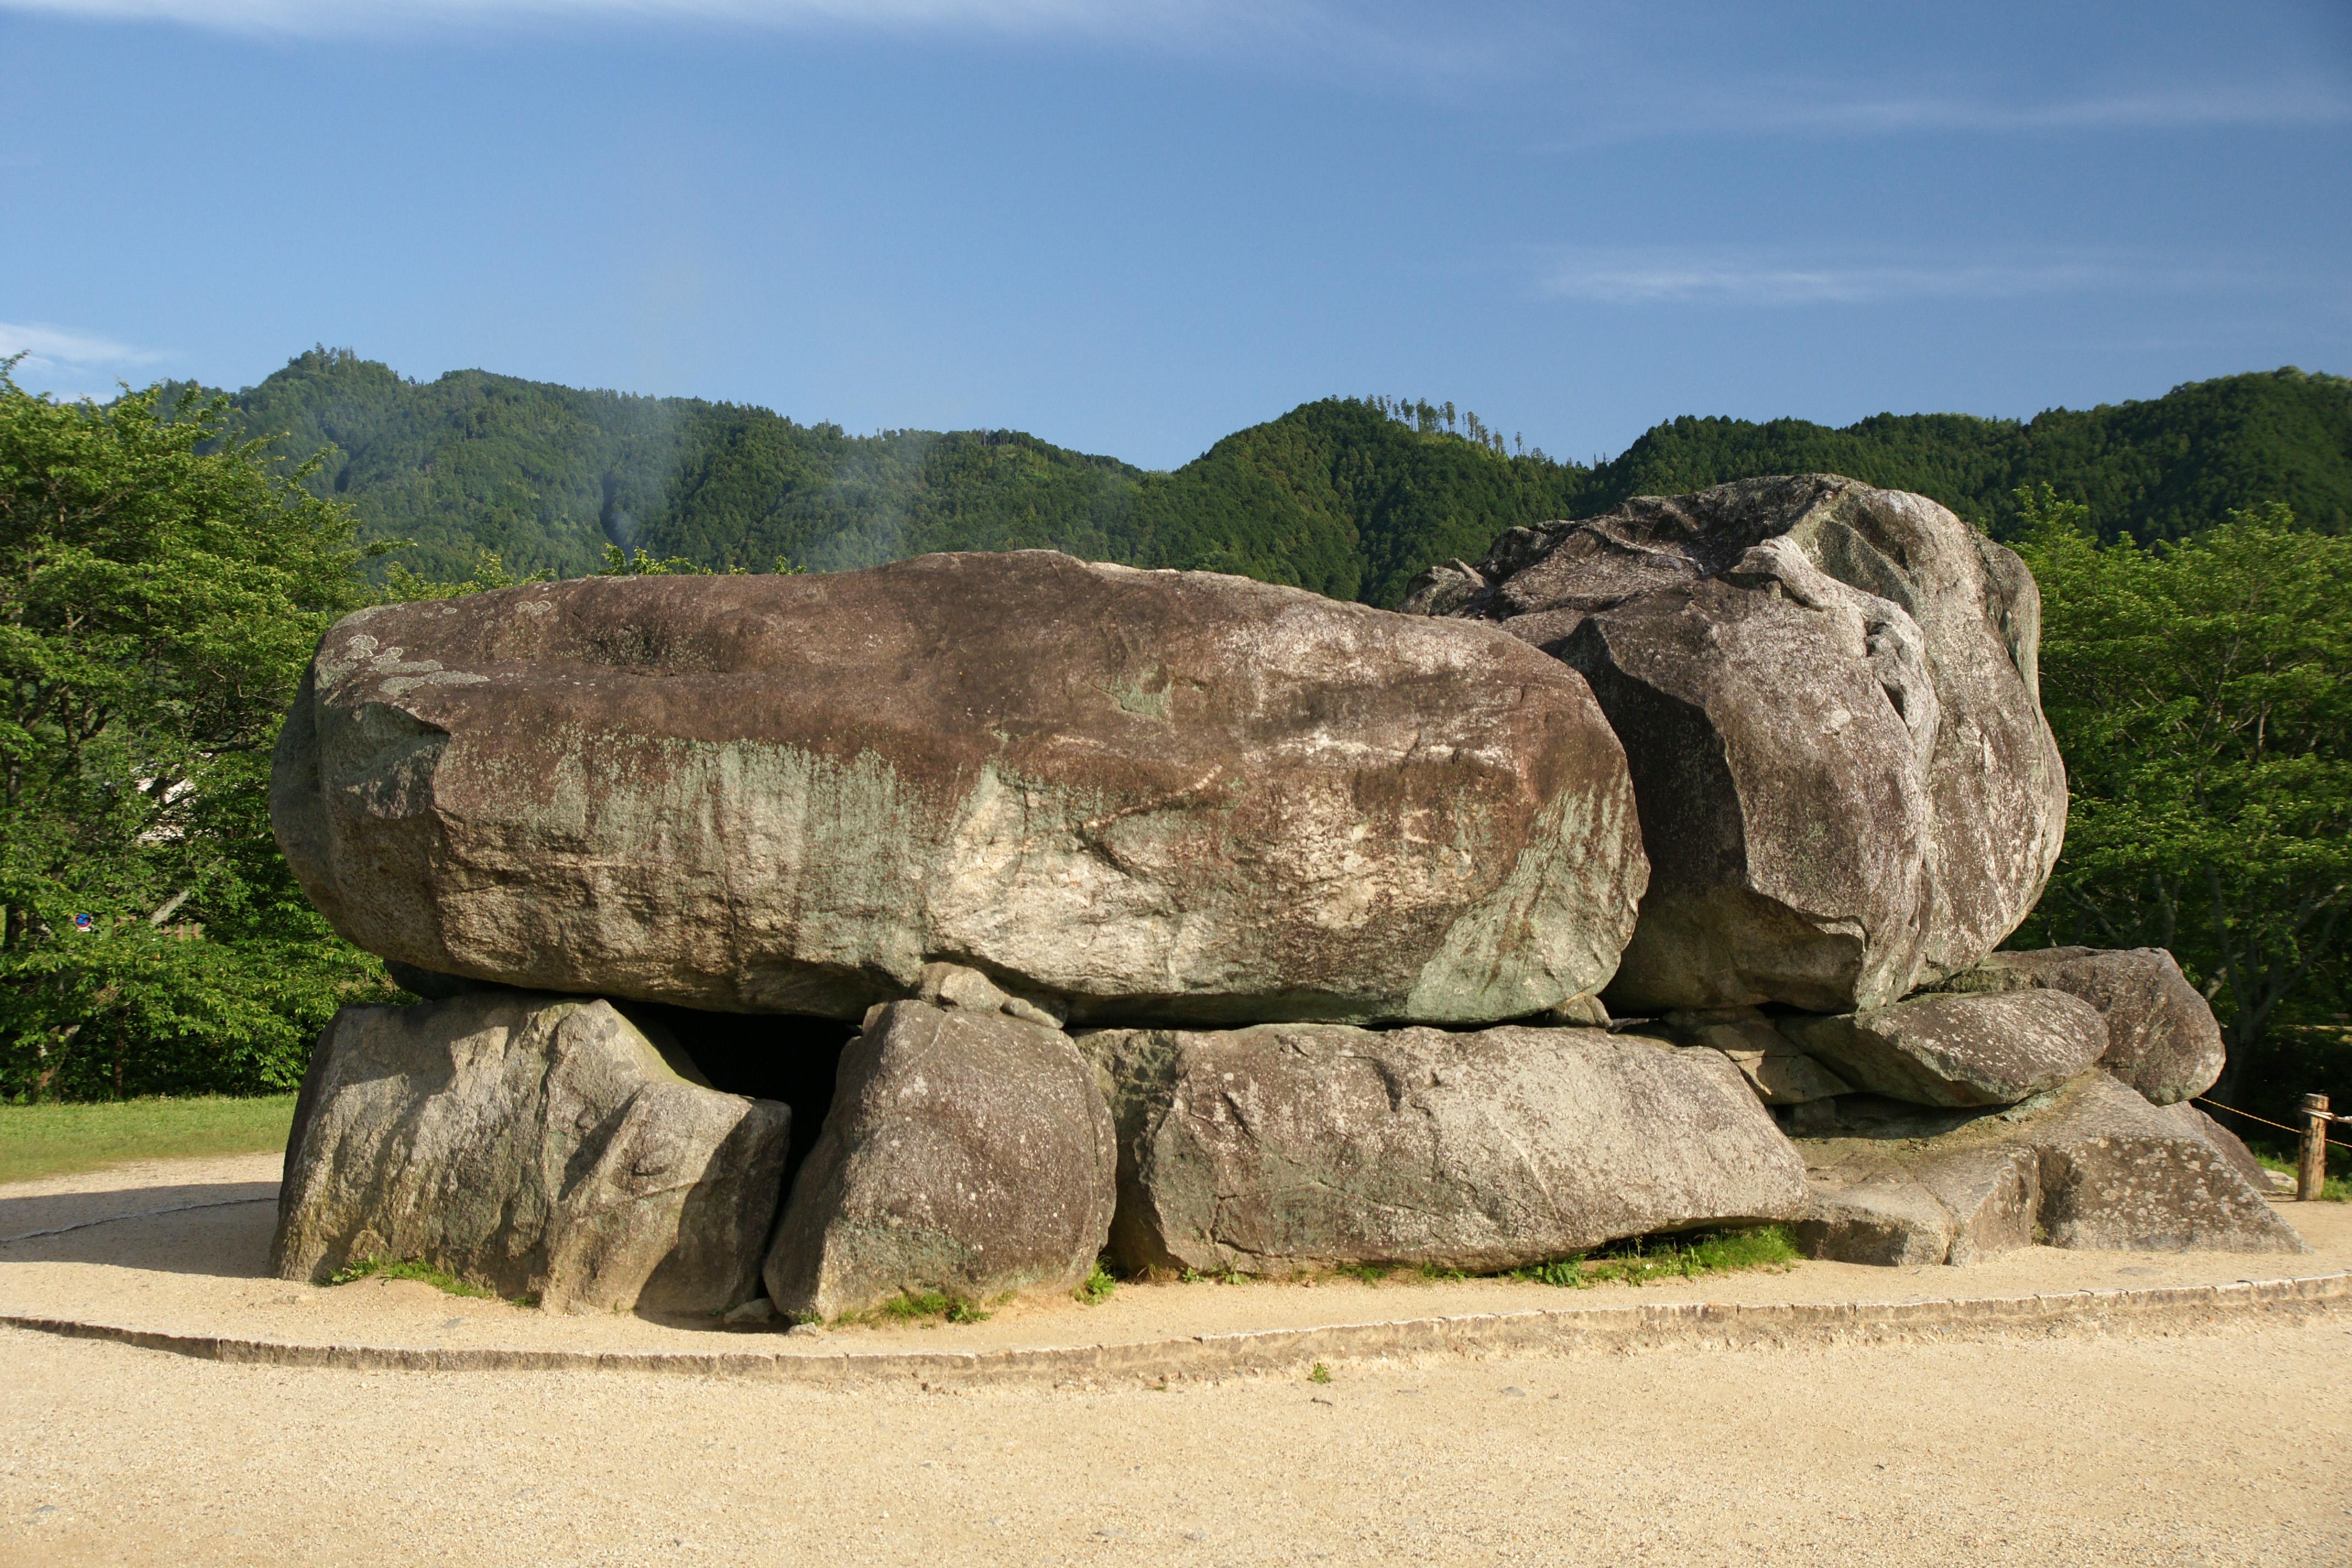 http://upload.wikimedia.org/wikipedia/commons/c/c7/Ishibutai-kofun_Asuka_Nara_pref05n4592.jpg